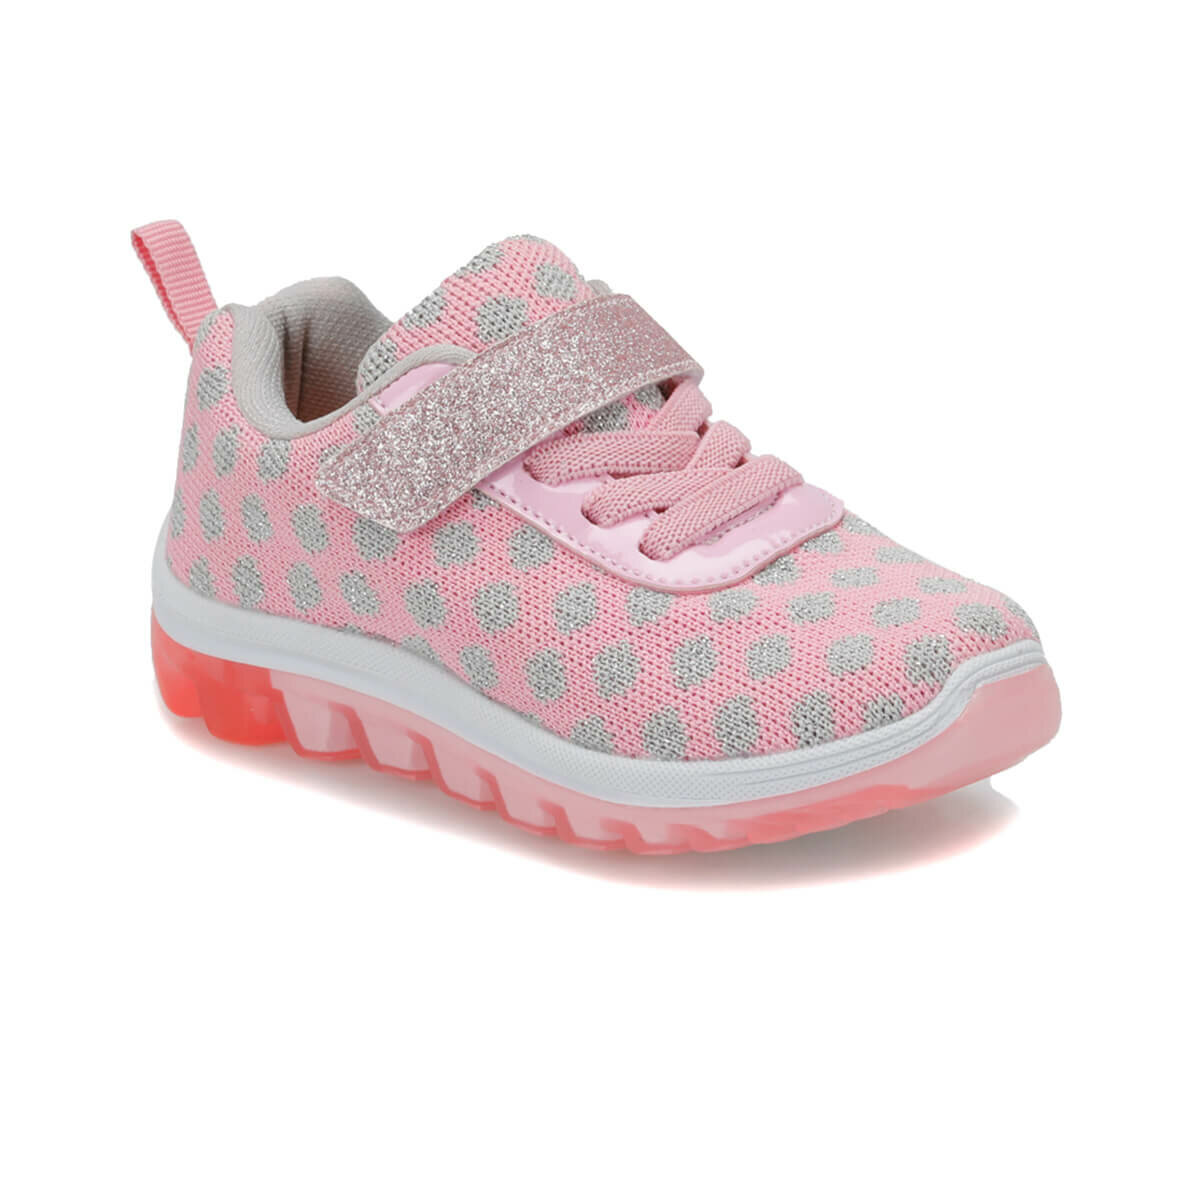 FLO YUFFY Fuchsia Female Child Sneaker Shoes I-Cool